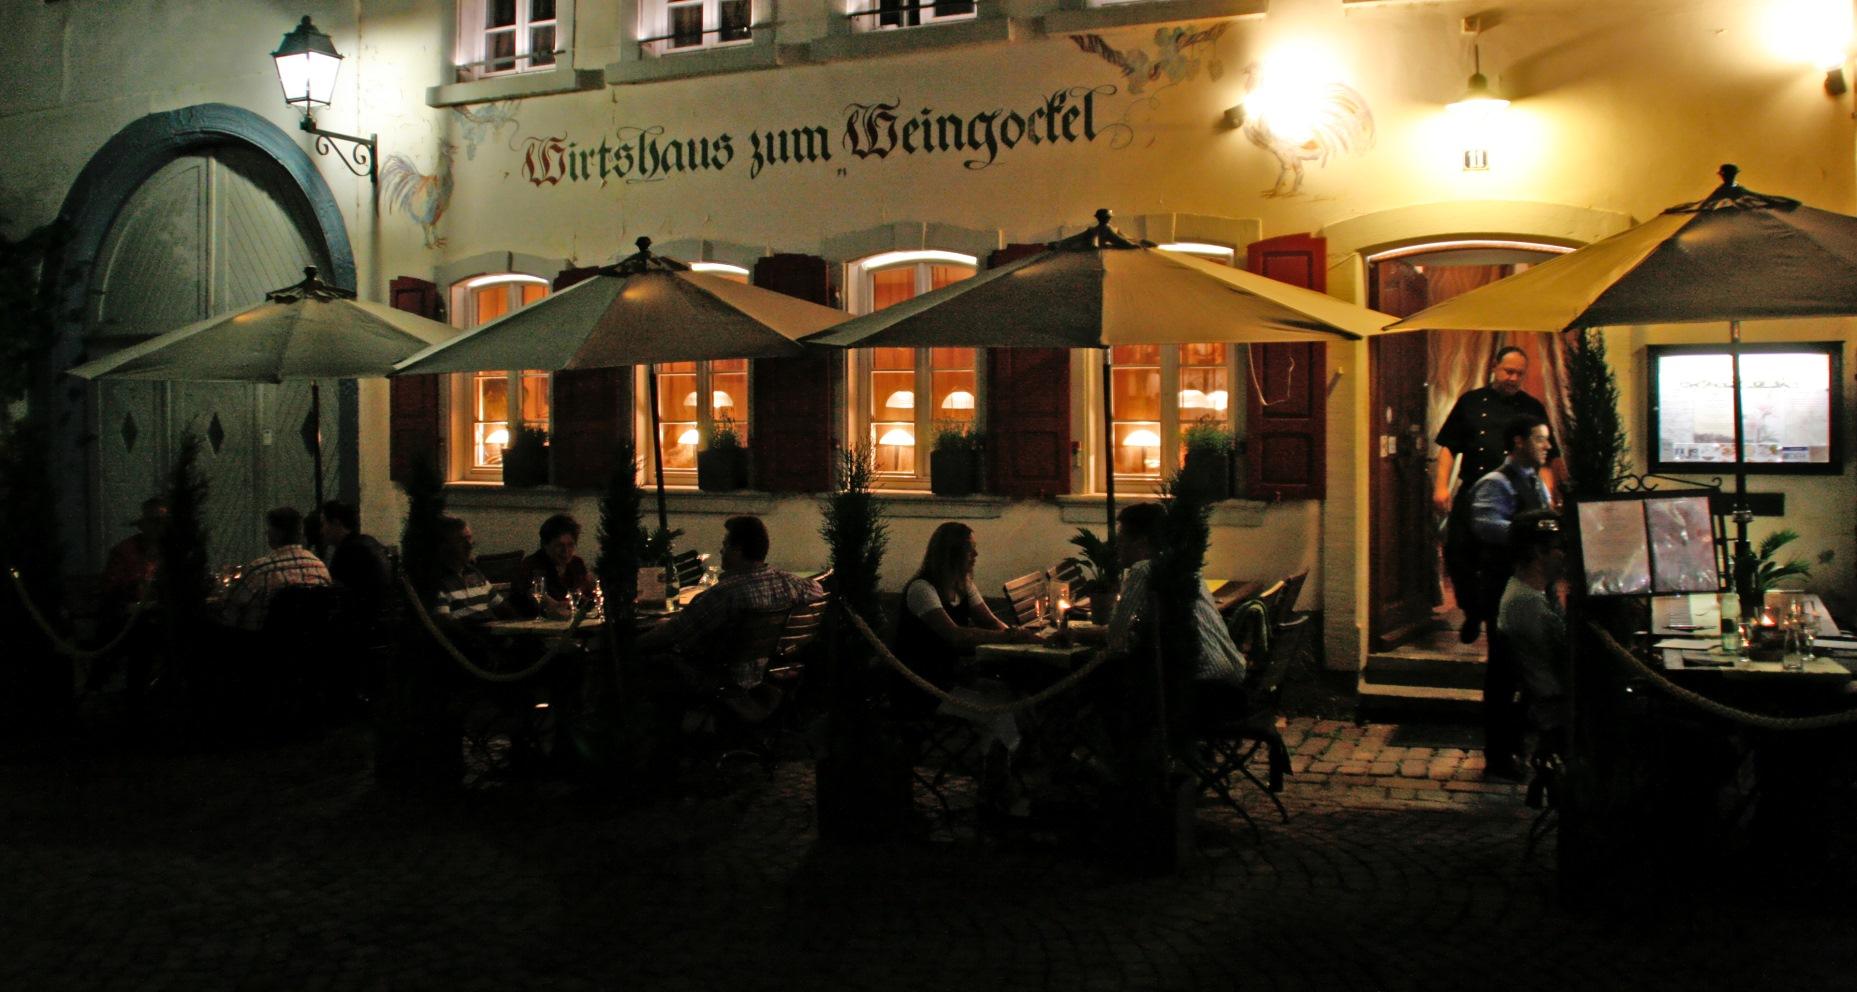 Restaurant-weingockel-freinsheim.de